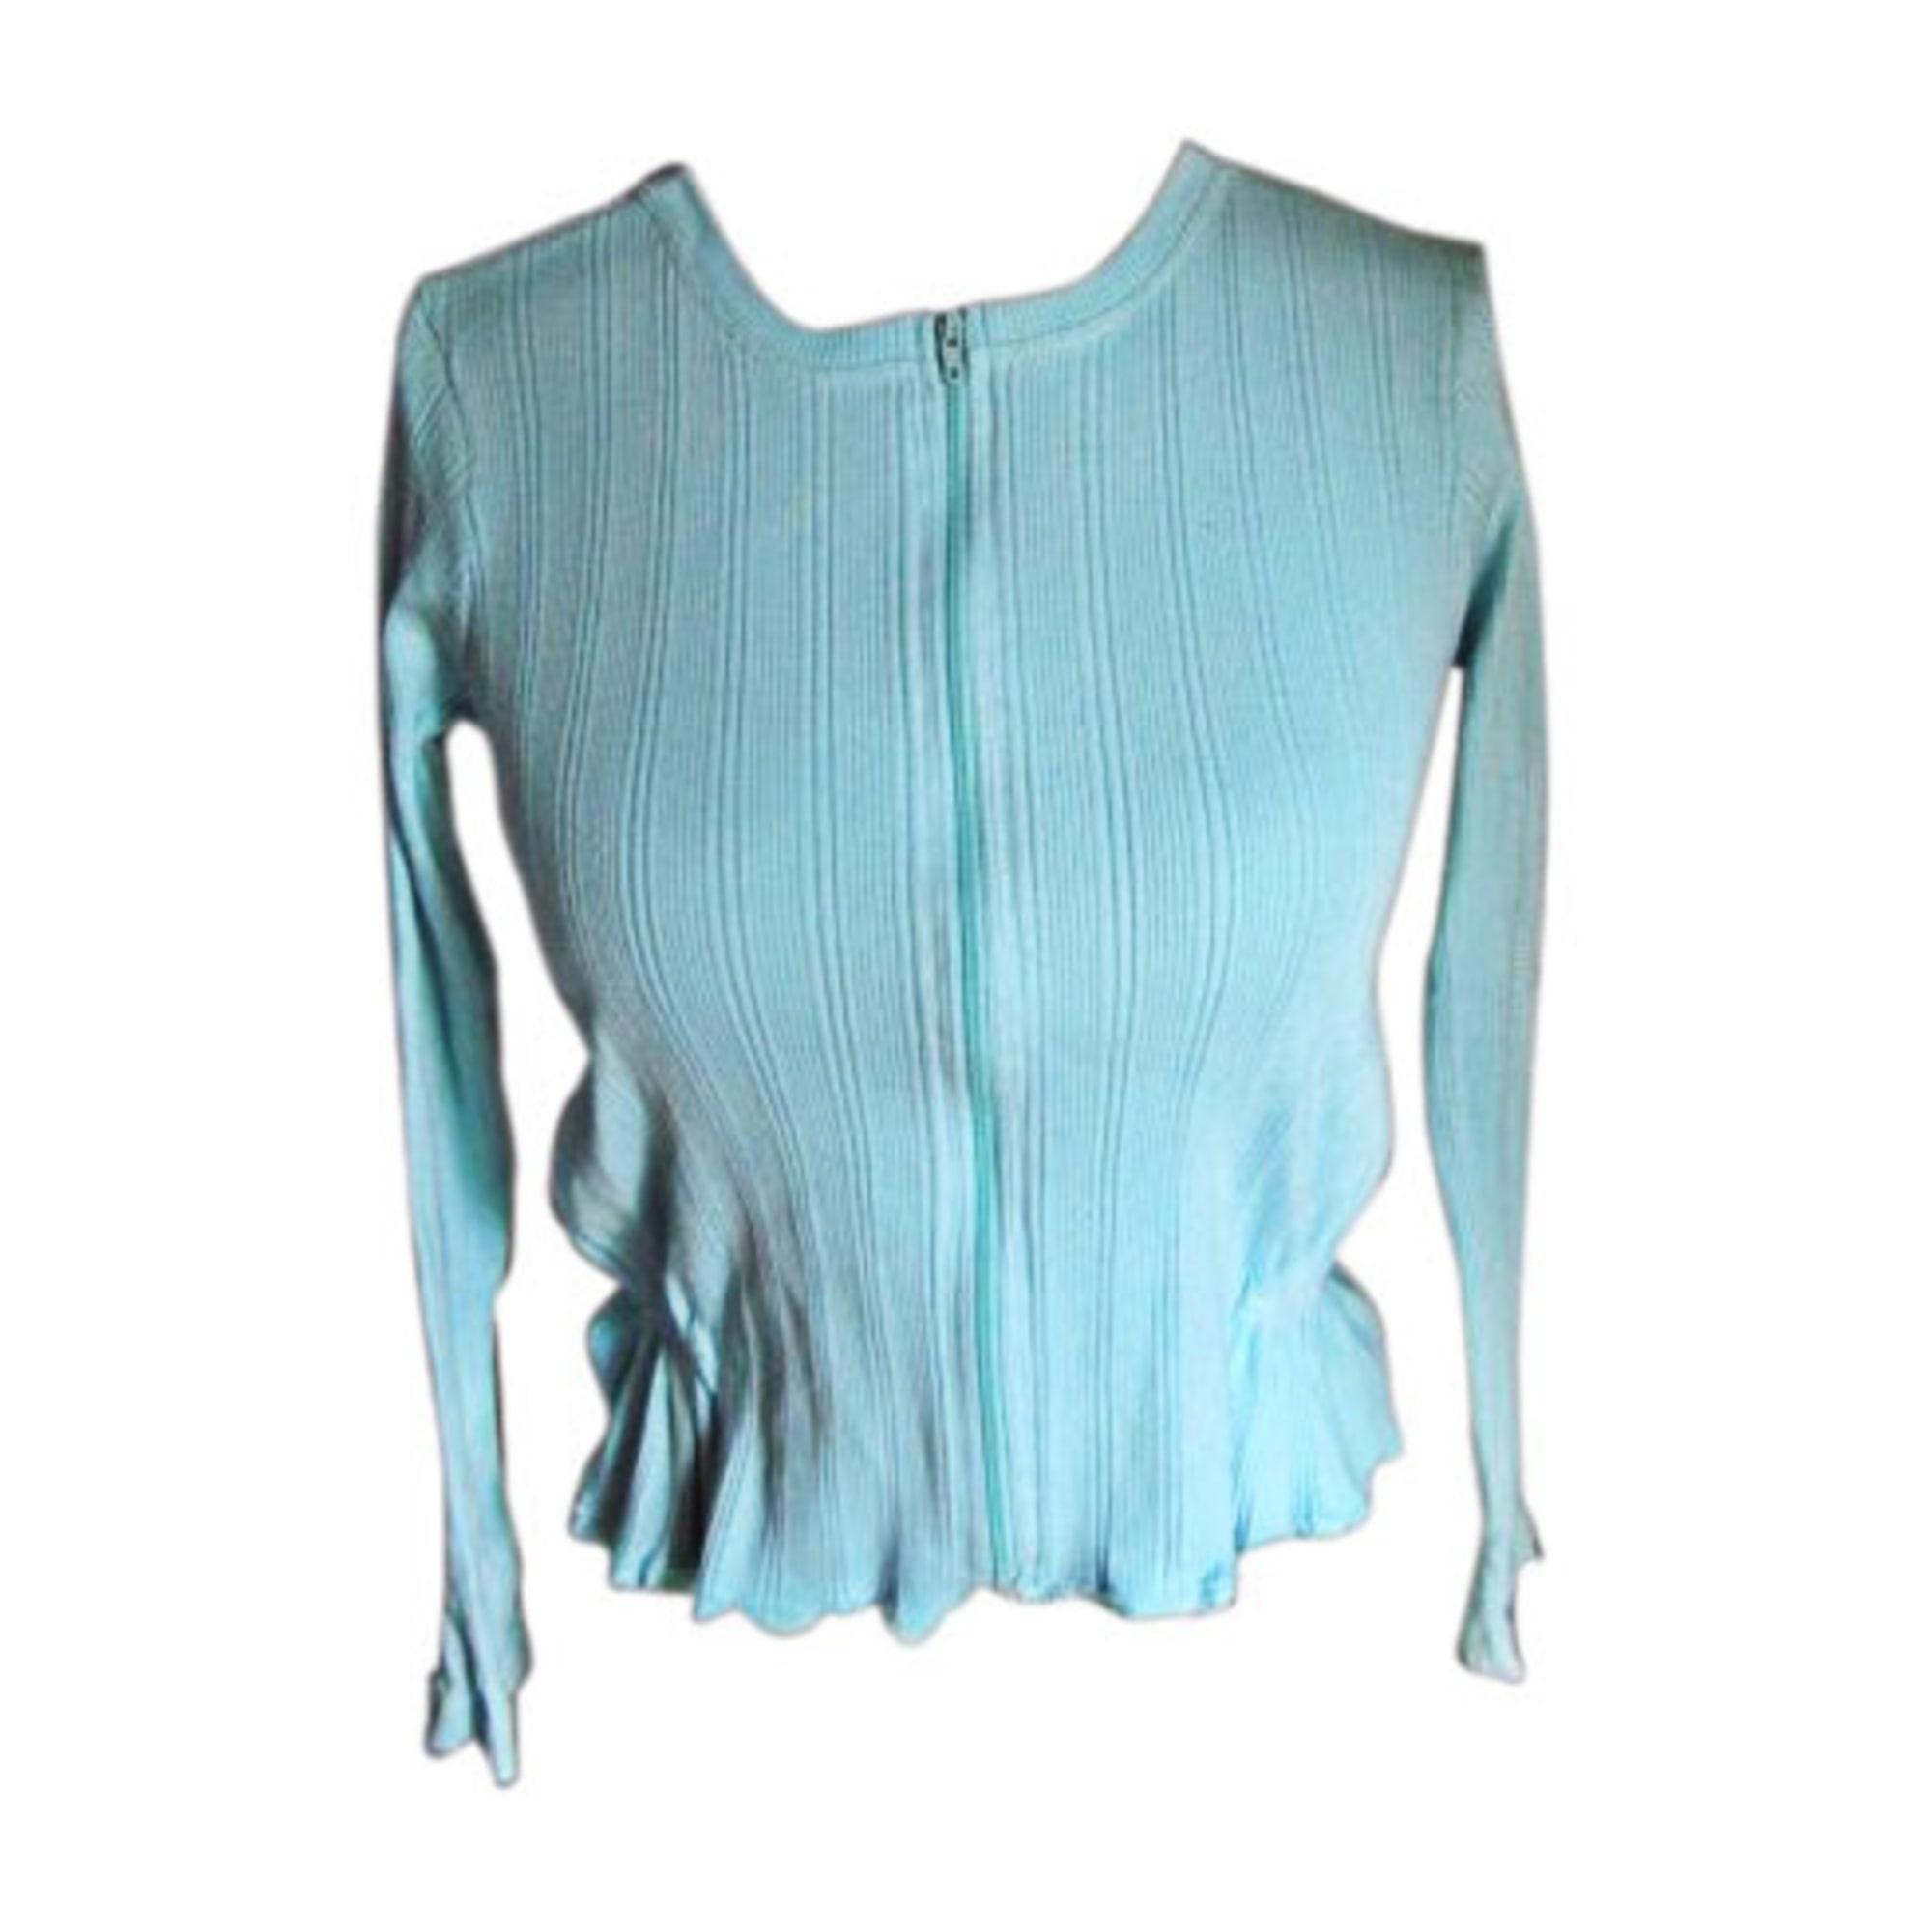 Gilet, cardigan LILI GAUFRETTE Bleu, bleu marine, bleu turquoise